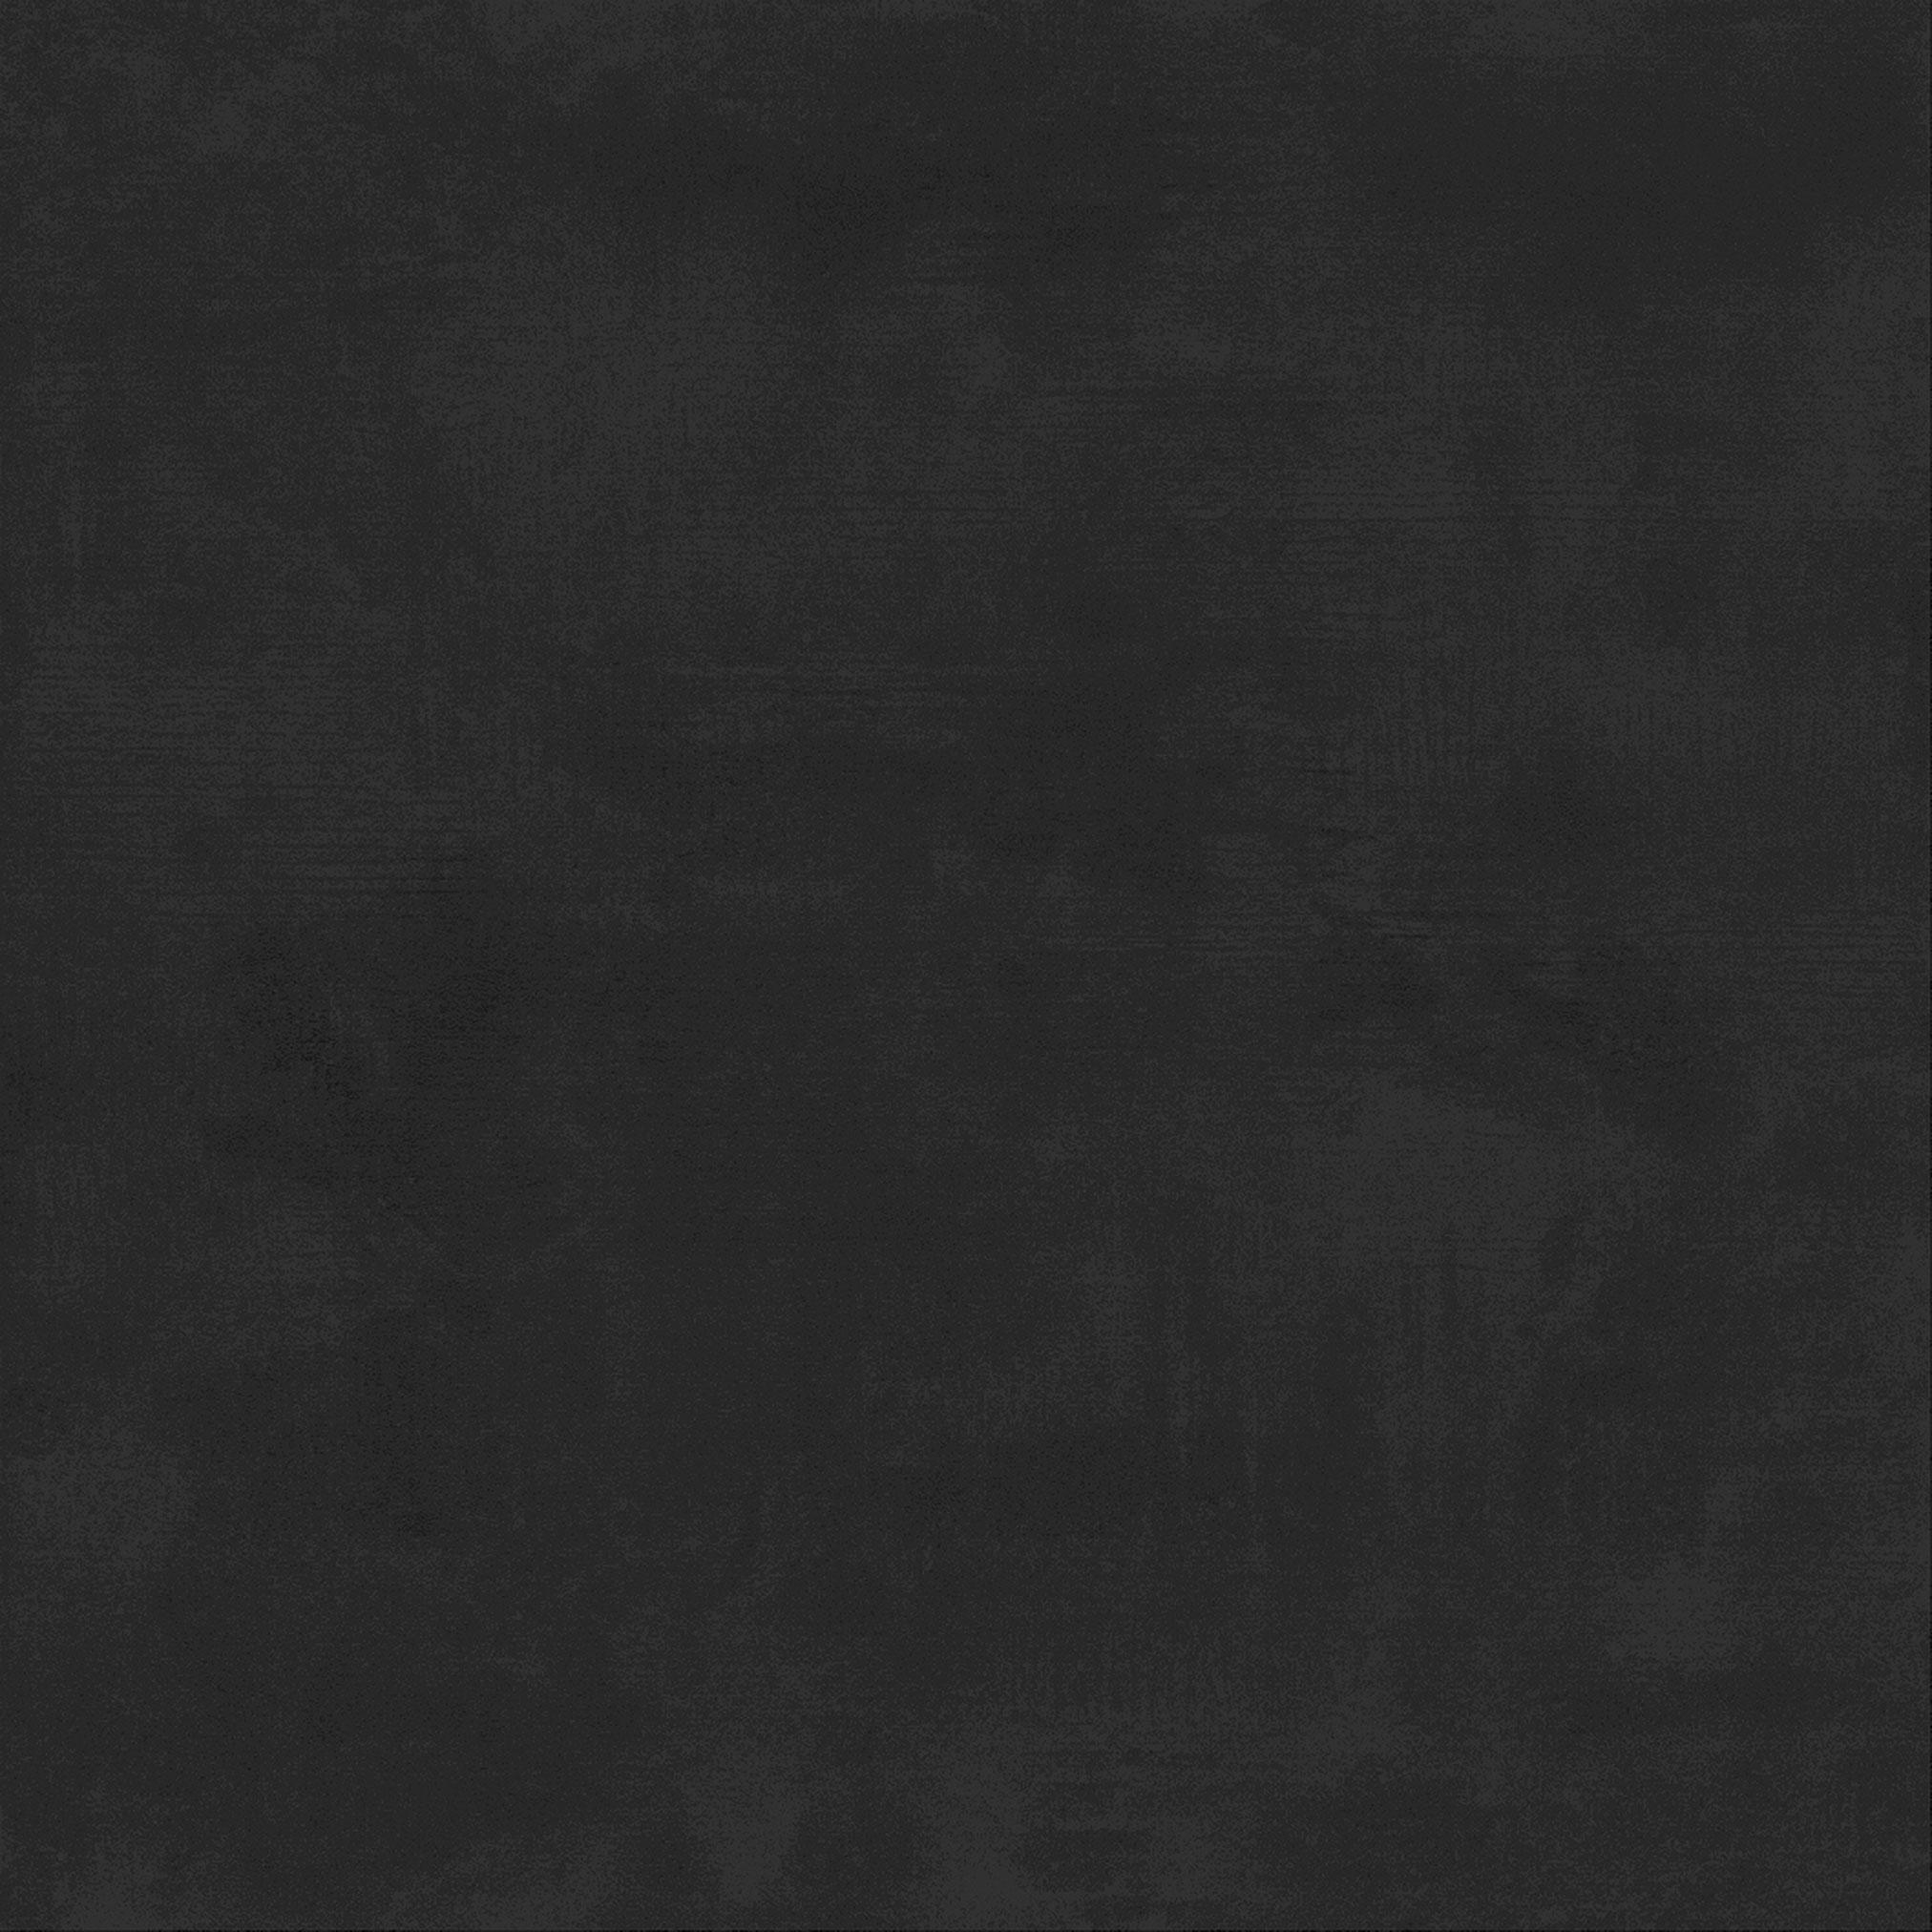 CEMENTO Negro 60x60, 45x45 and 30x60